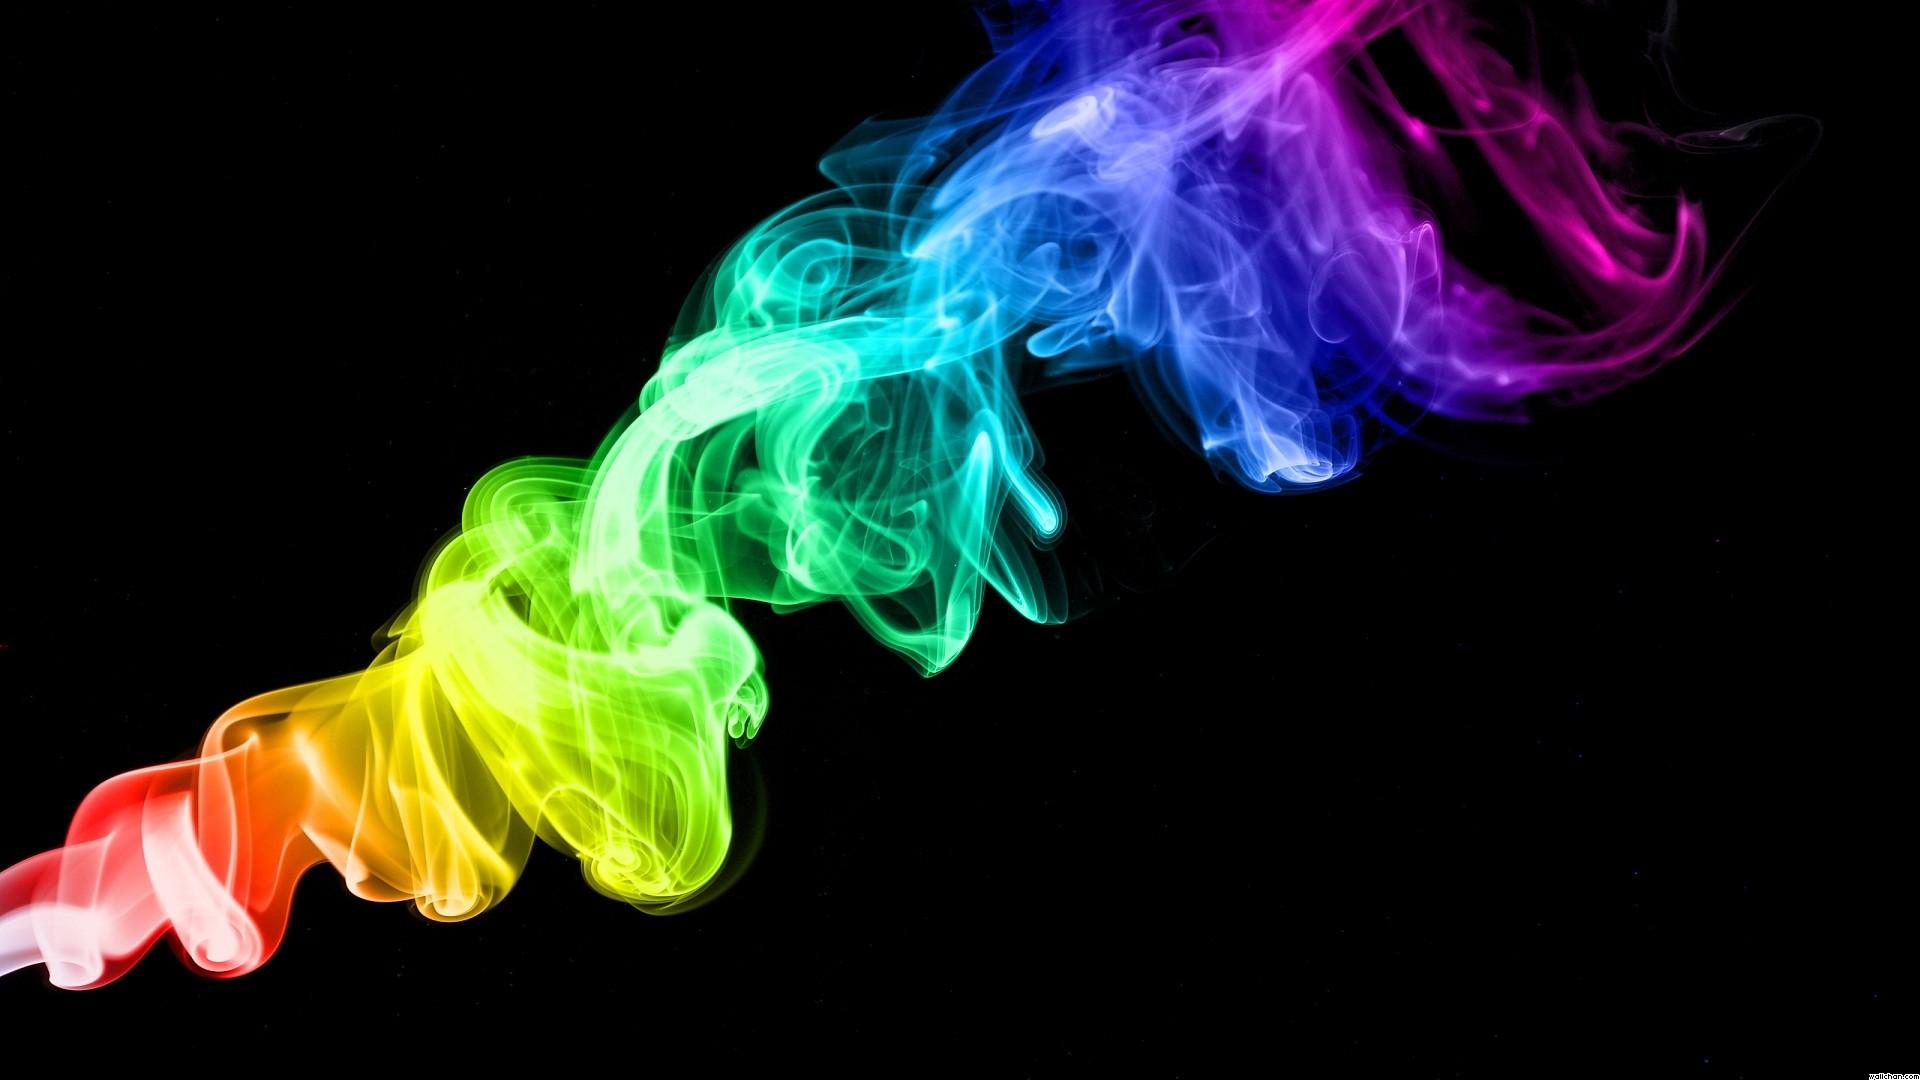 High Resolution Rainbow Smoke Wallpaper Background – SiWallpaperHD .